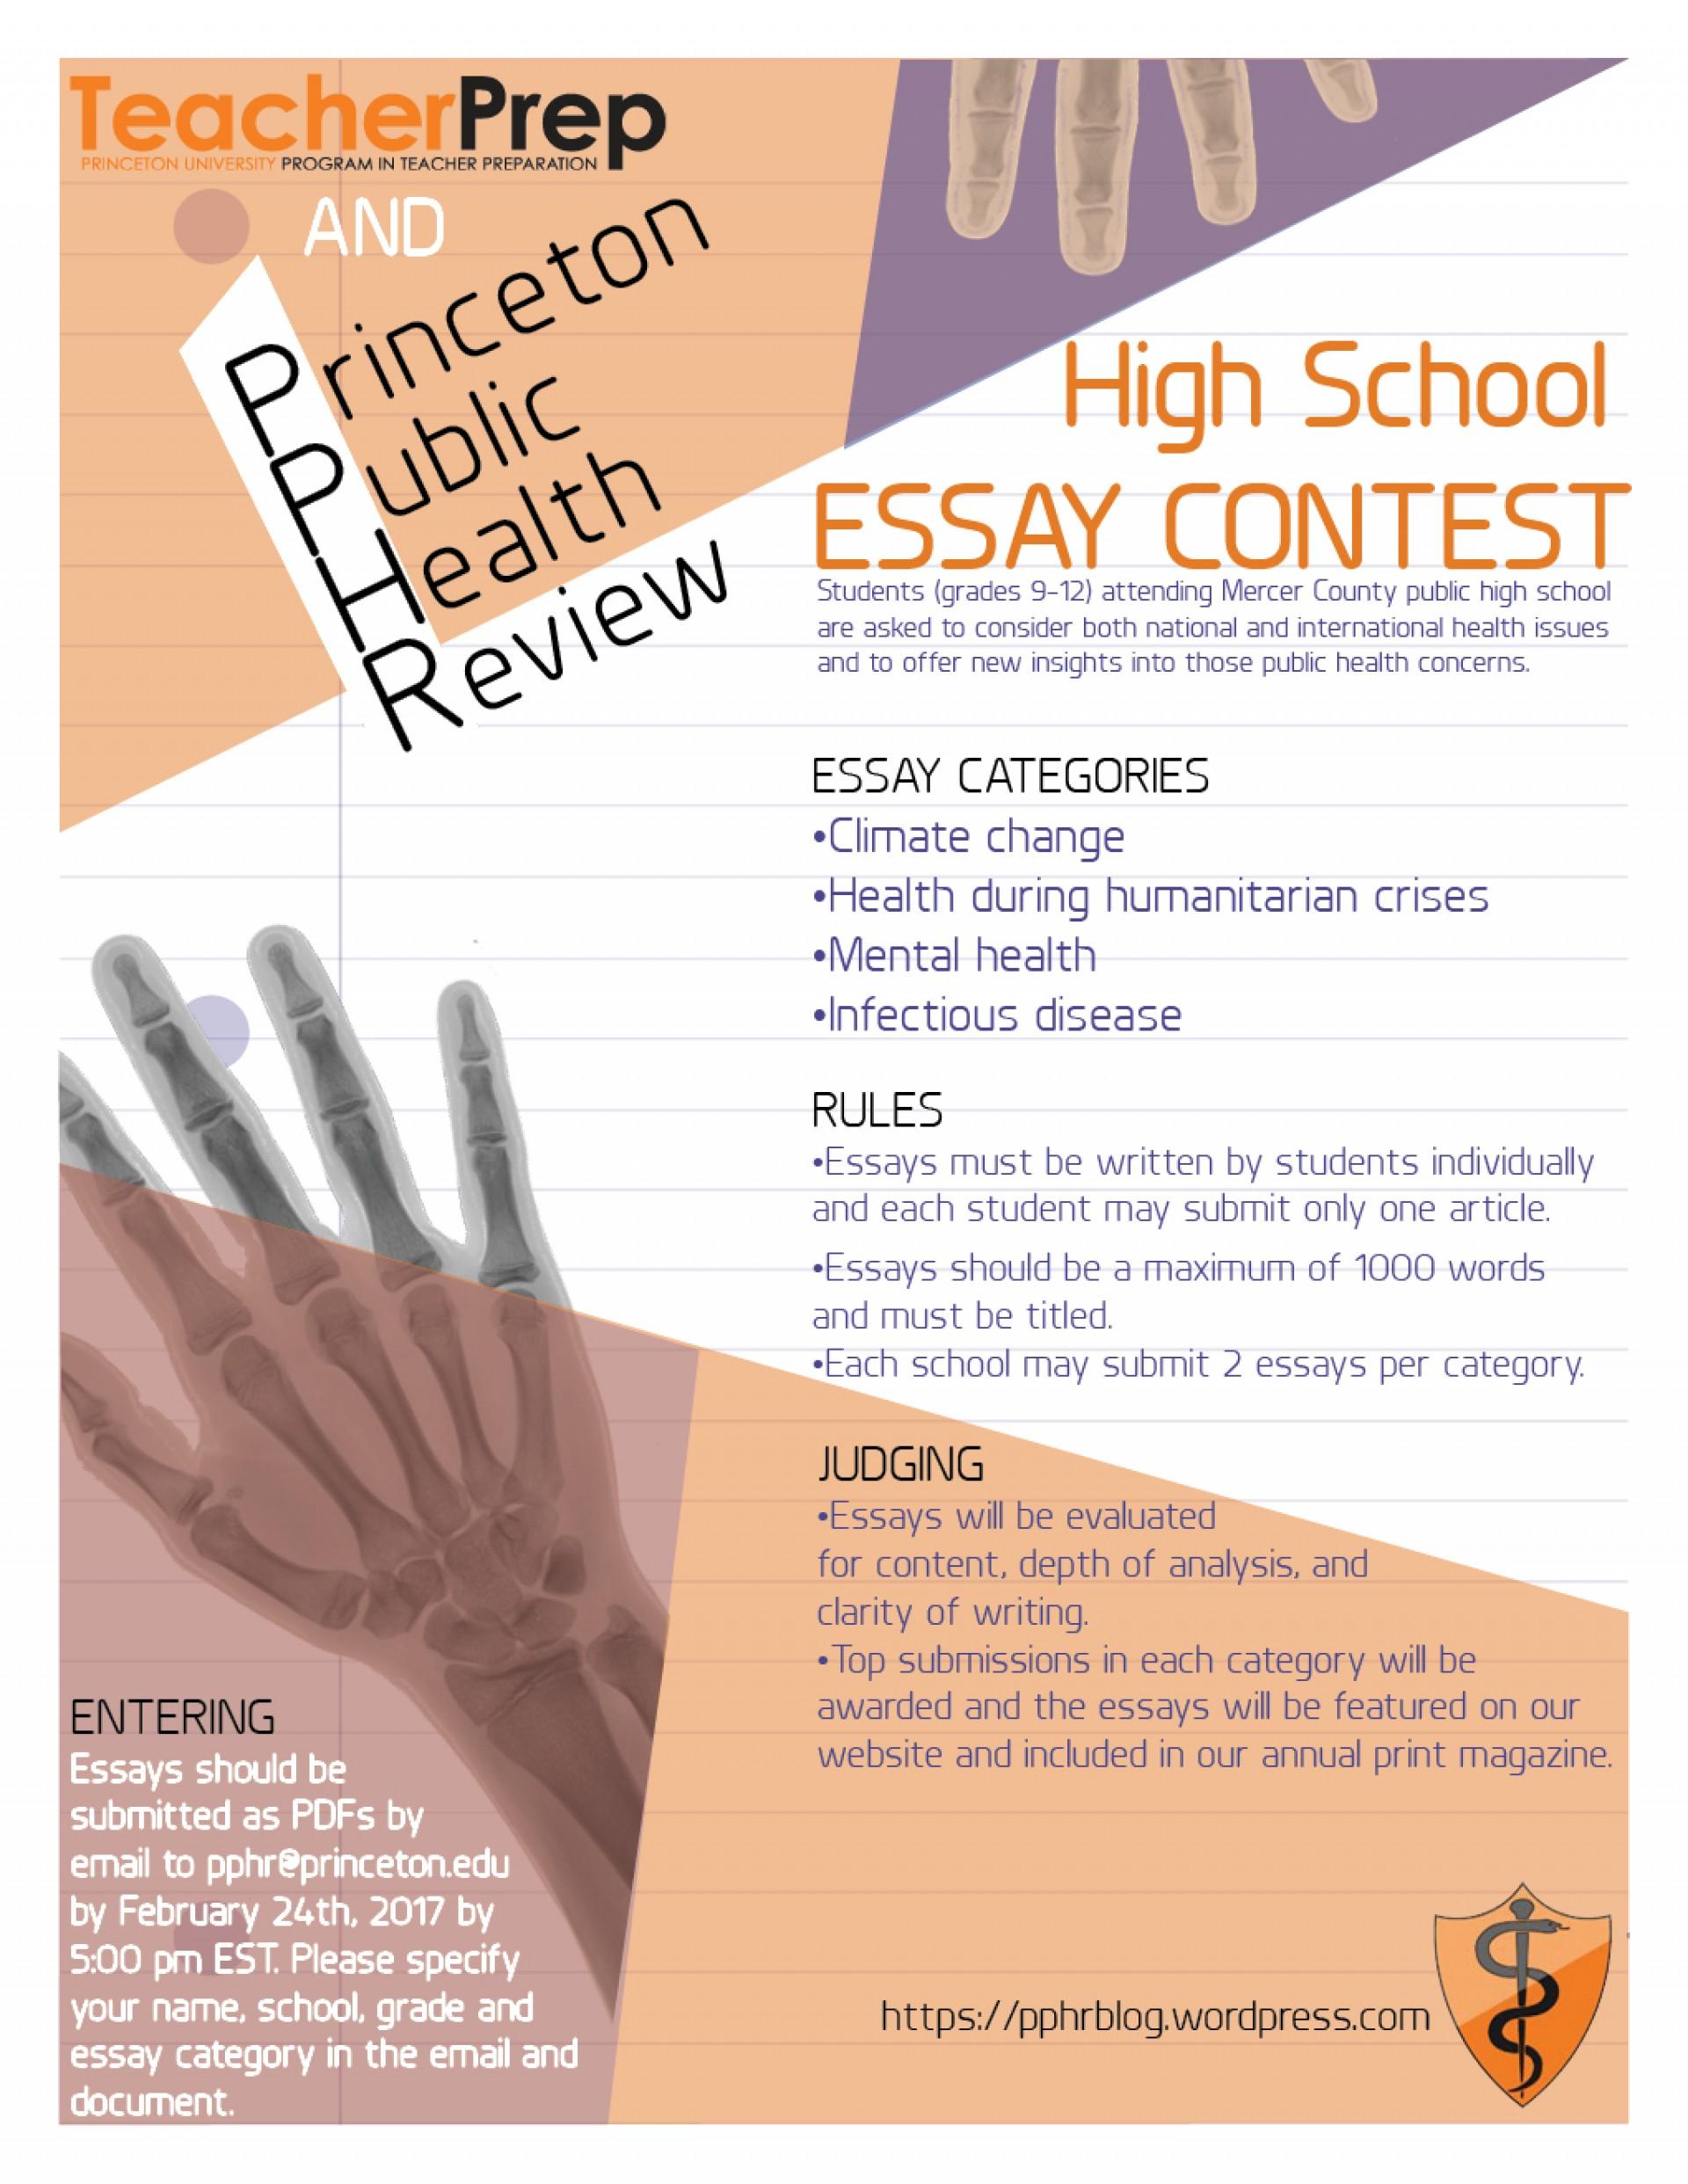 015 Princeton Essay Pphressaycontestfeb24 Astounding Review College Guide Graded Confidential 1920